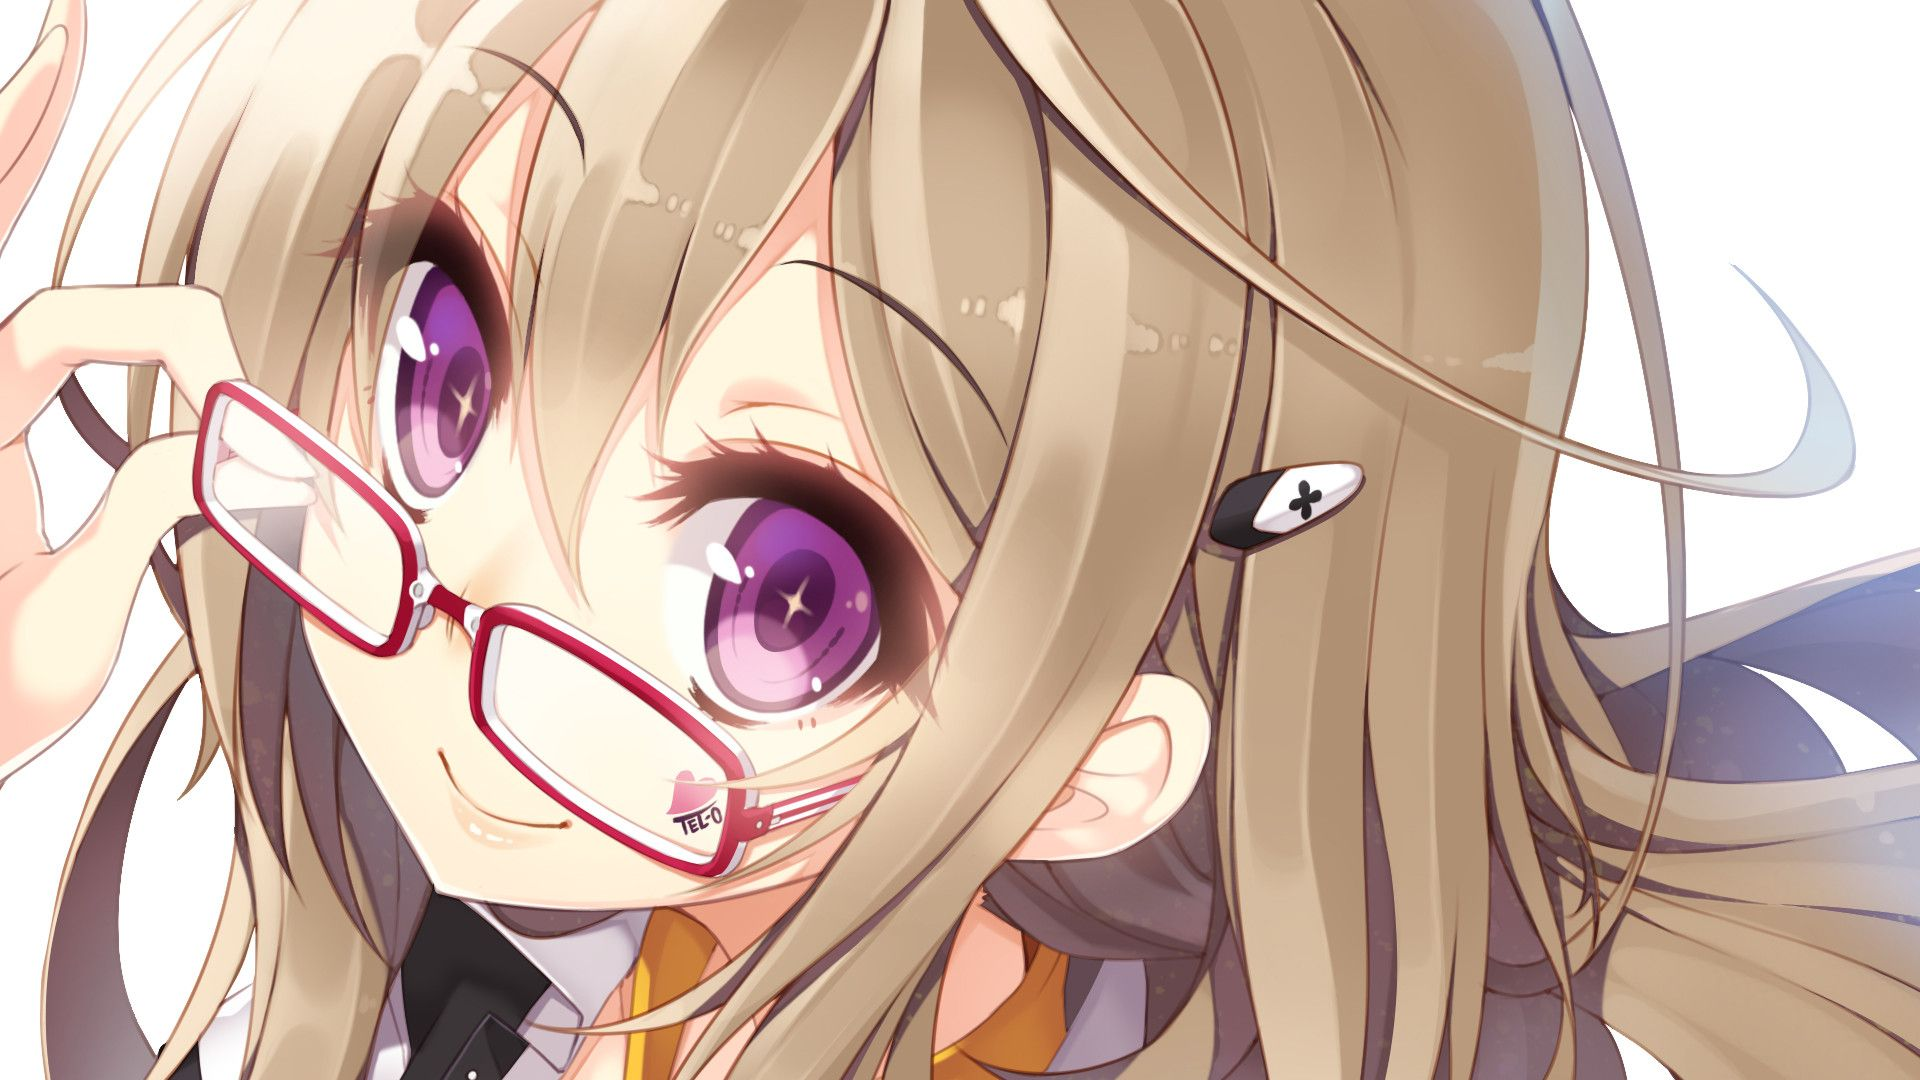 anime girl - violet eyes - blond hair